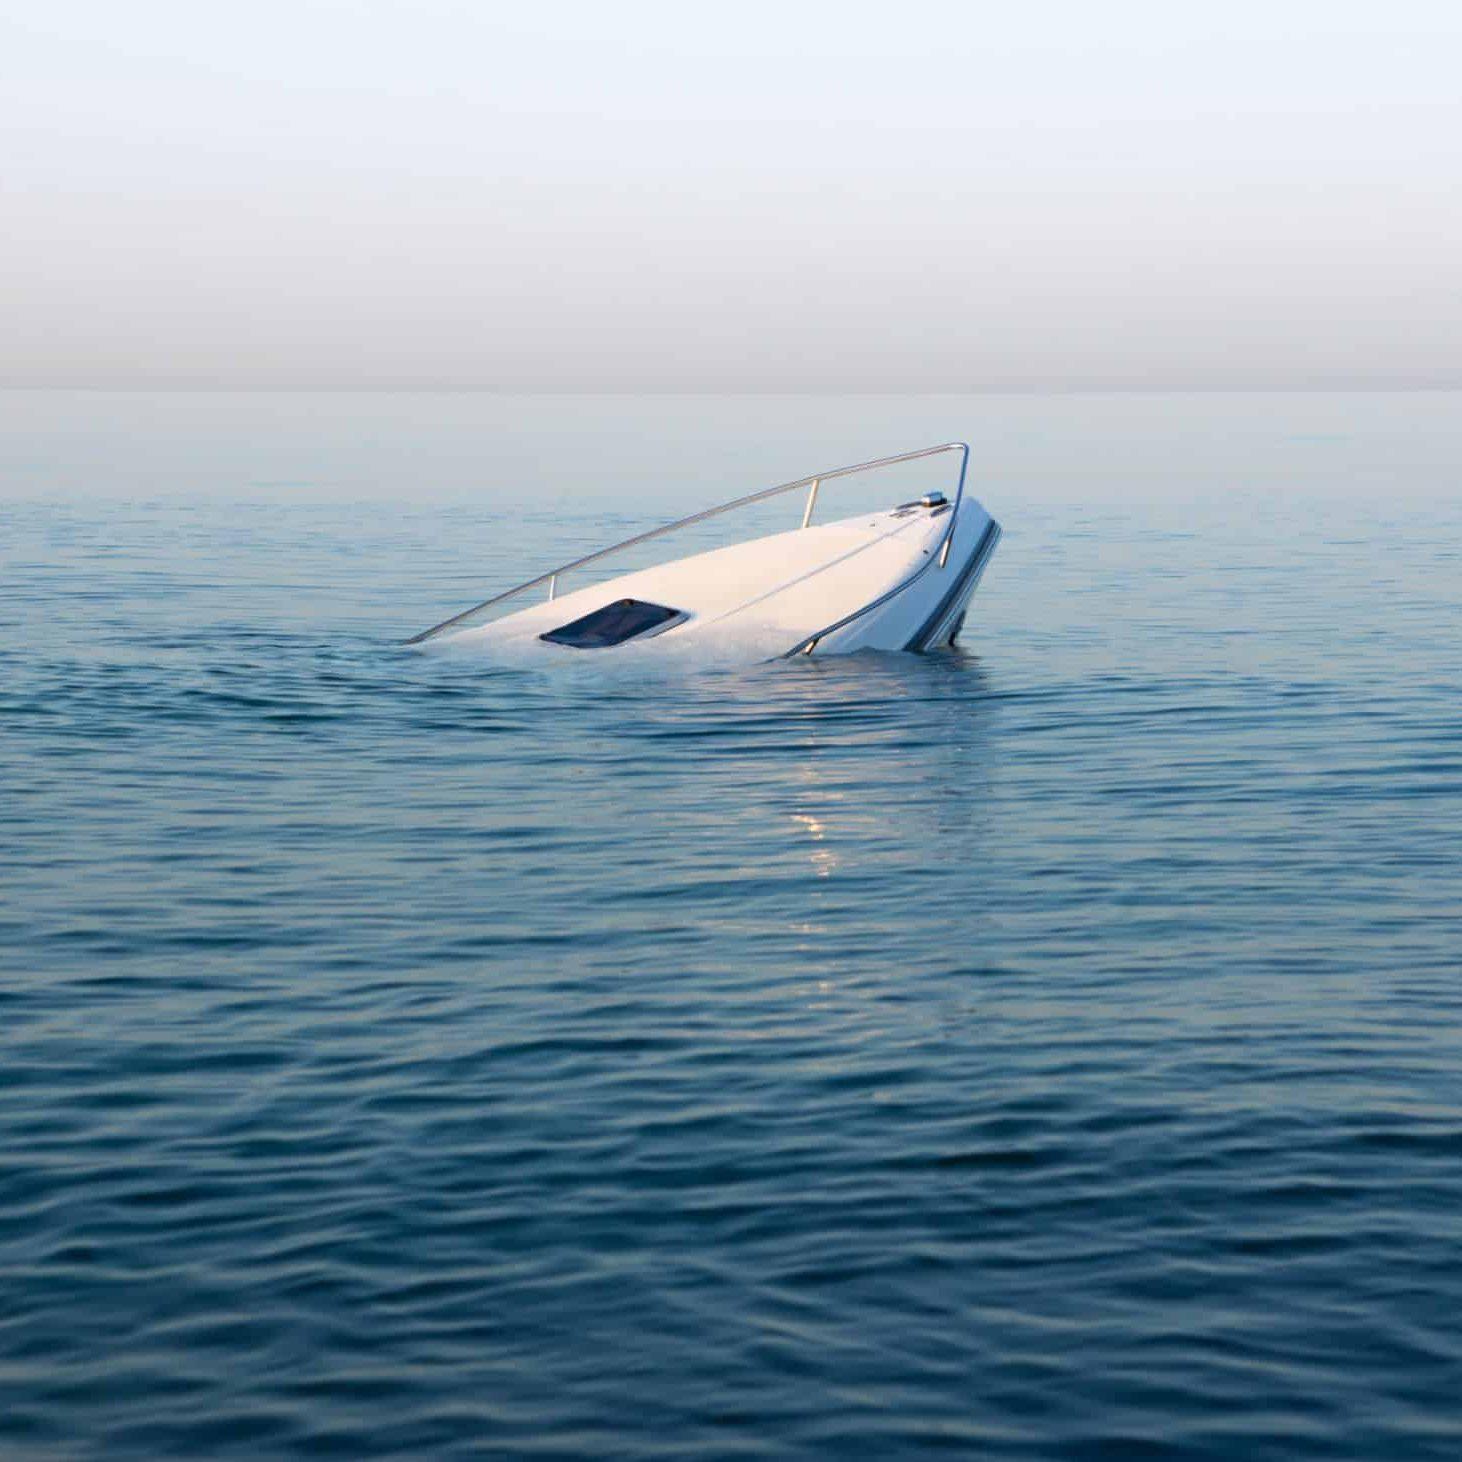 Modern white boat goes underwater after crash